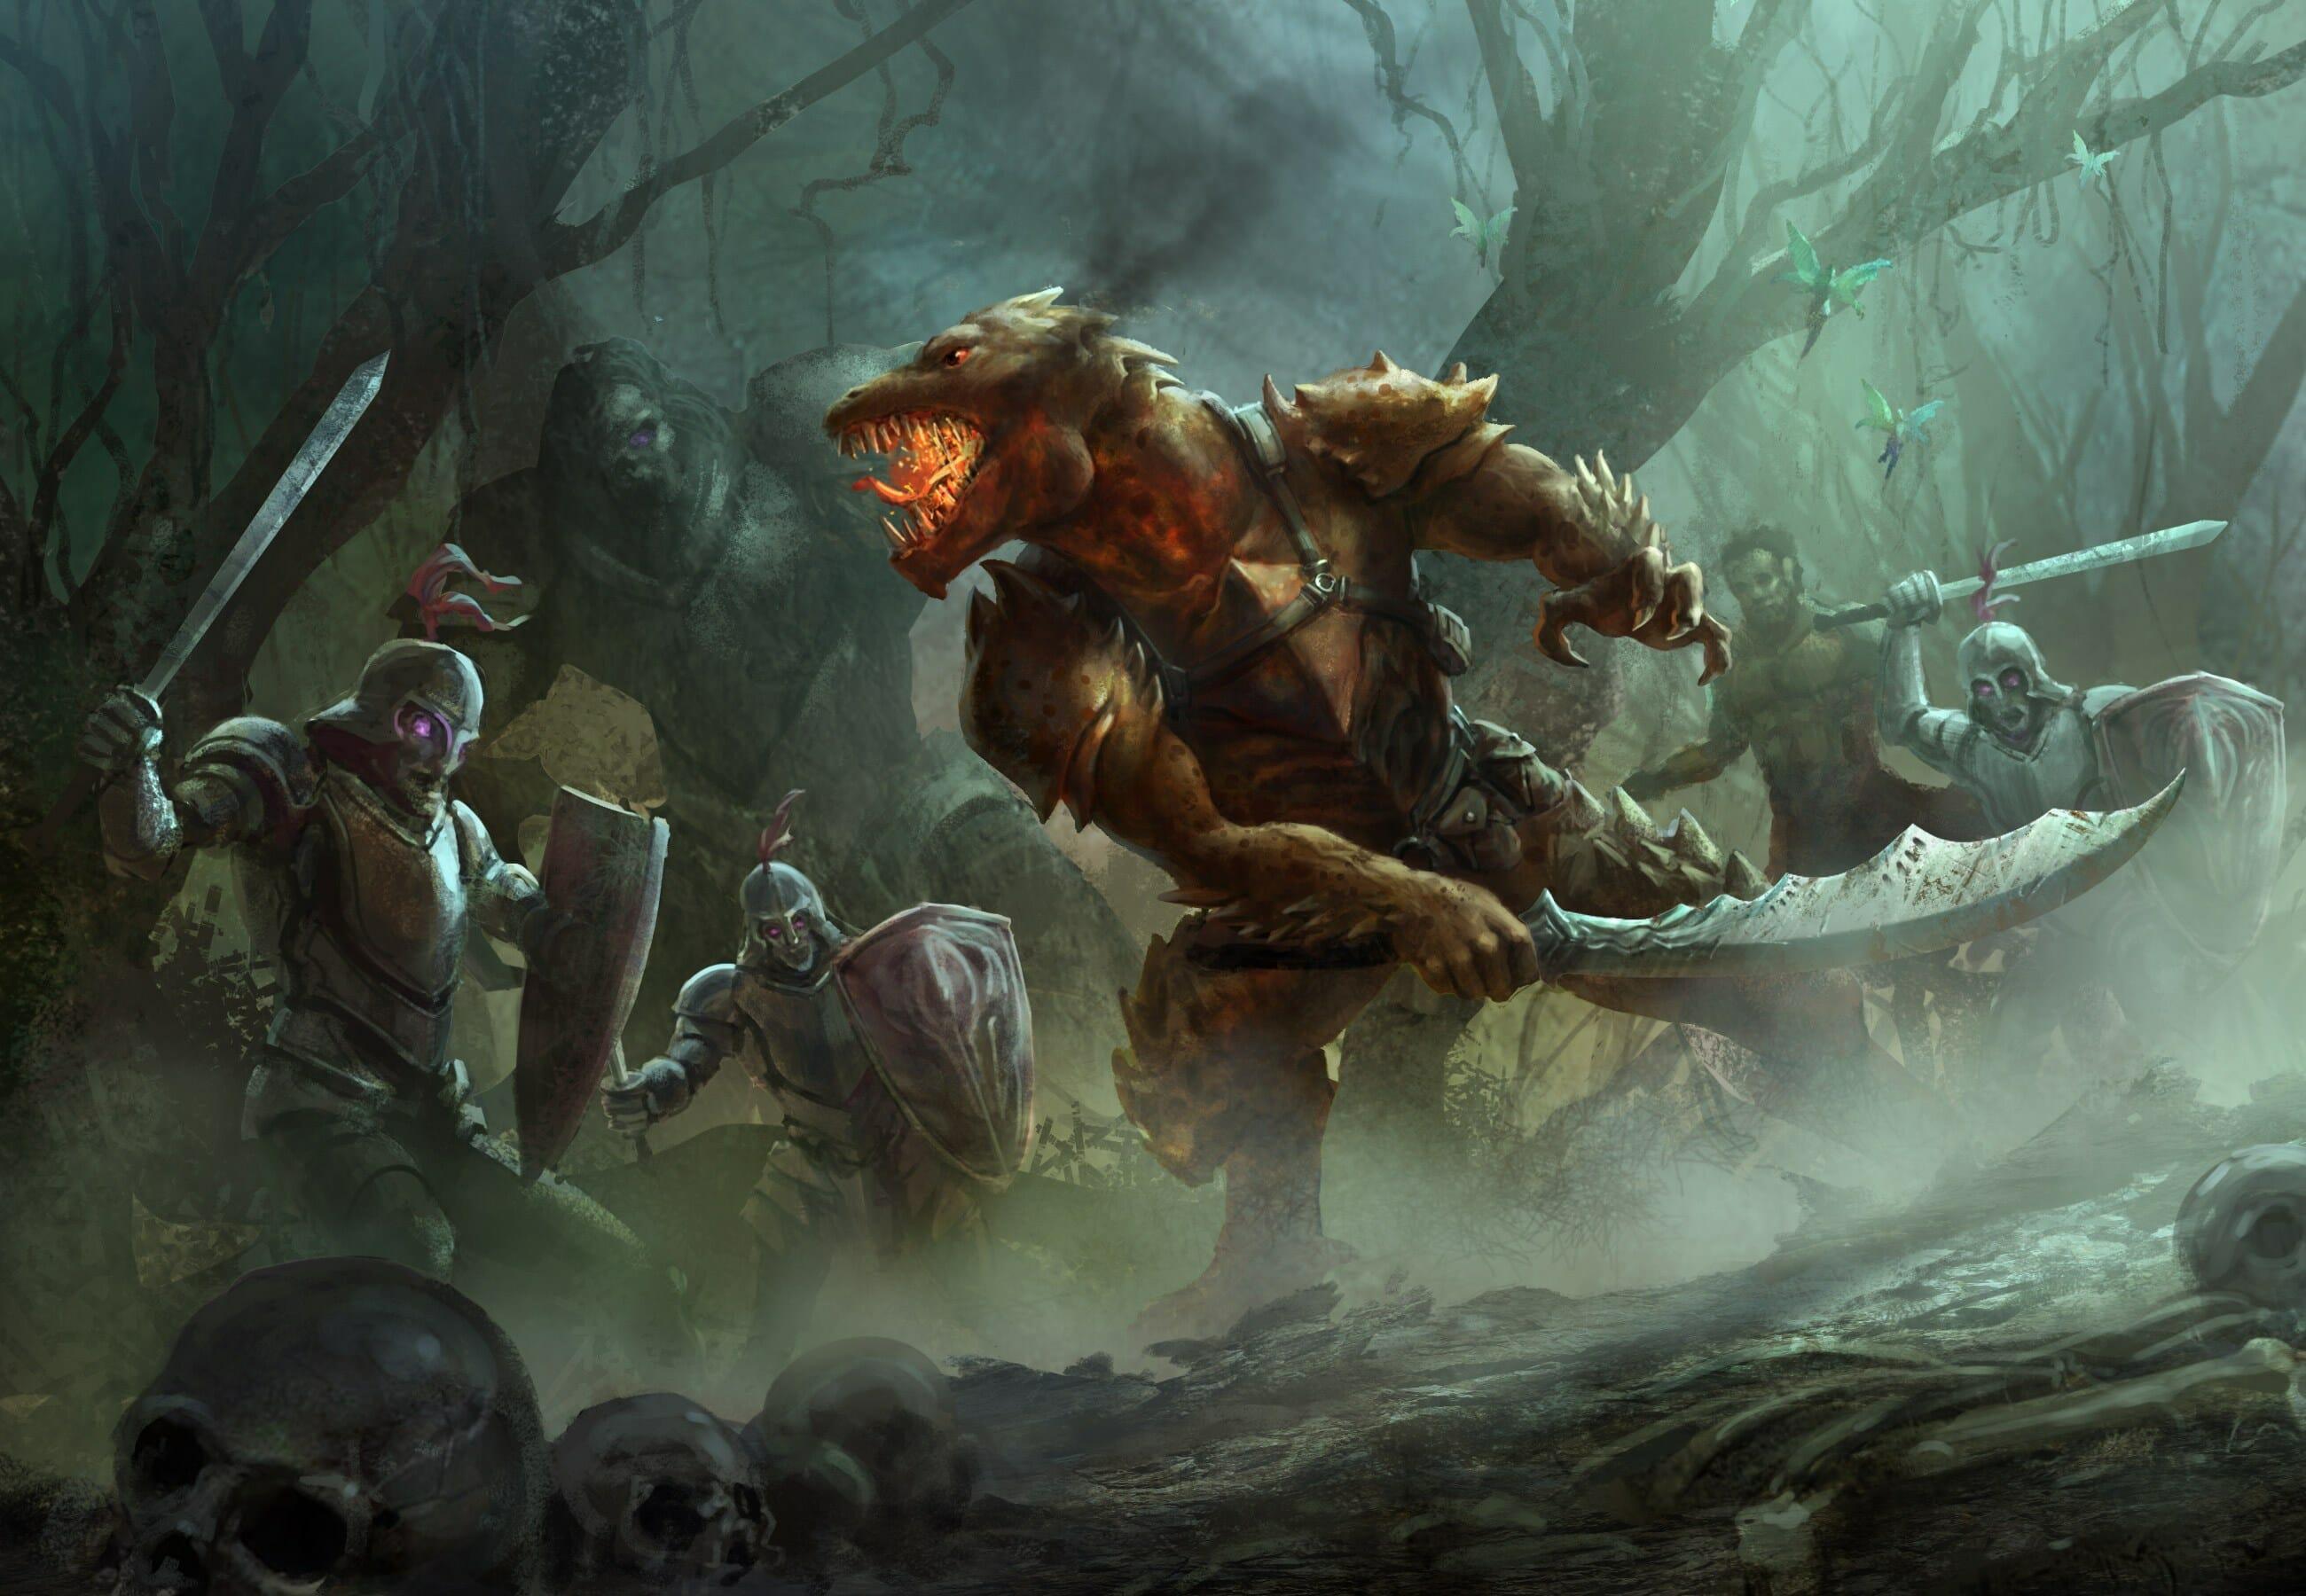 Mantic Games announce Kings of War RPG